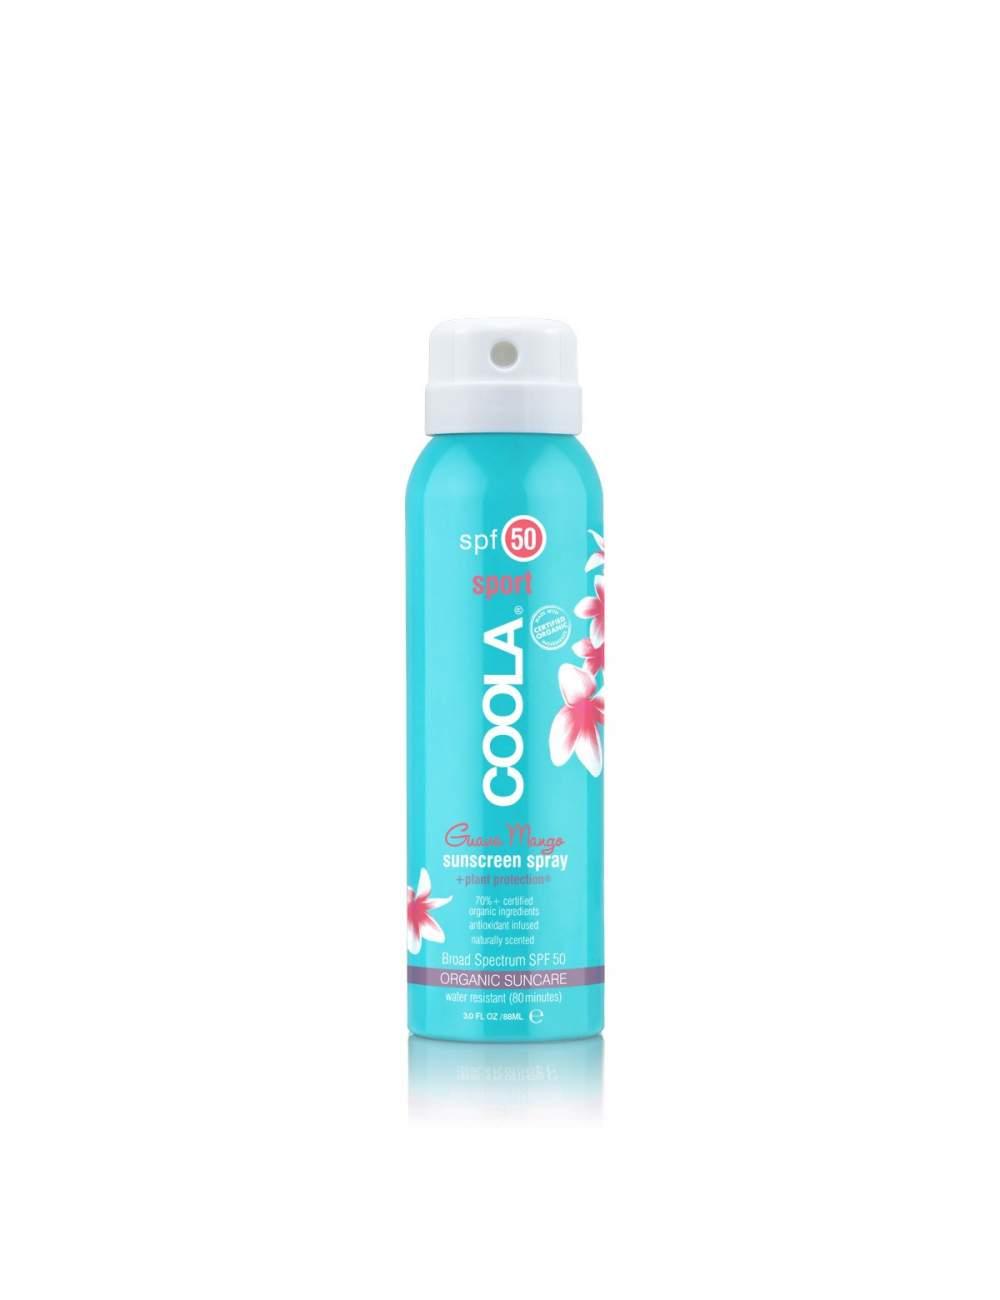 Crème de Protection Solaire Corporelle Organique SPF 50 en Spray Guava Mango. Sport Continuous. Coola.